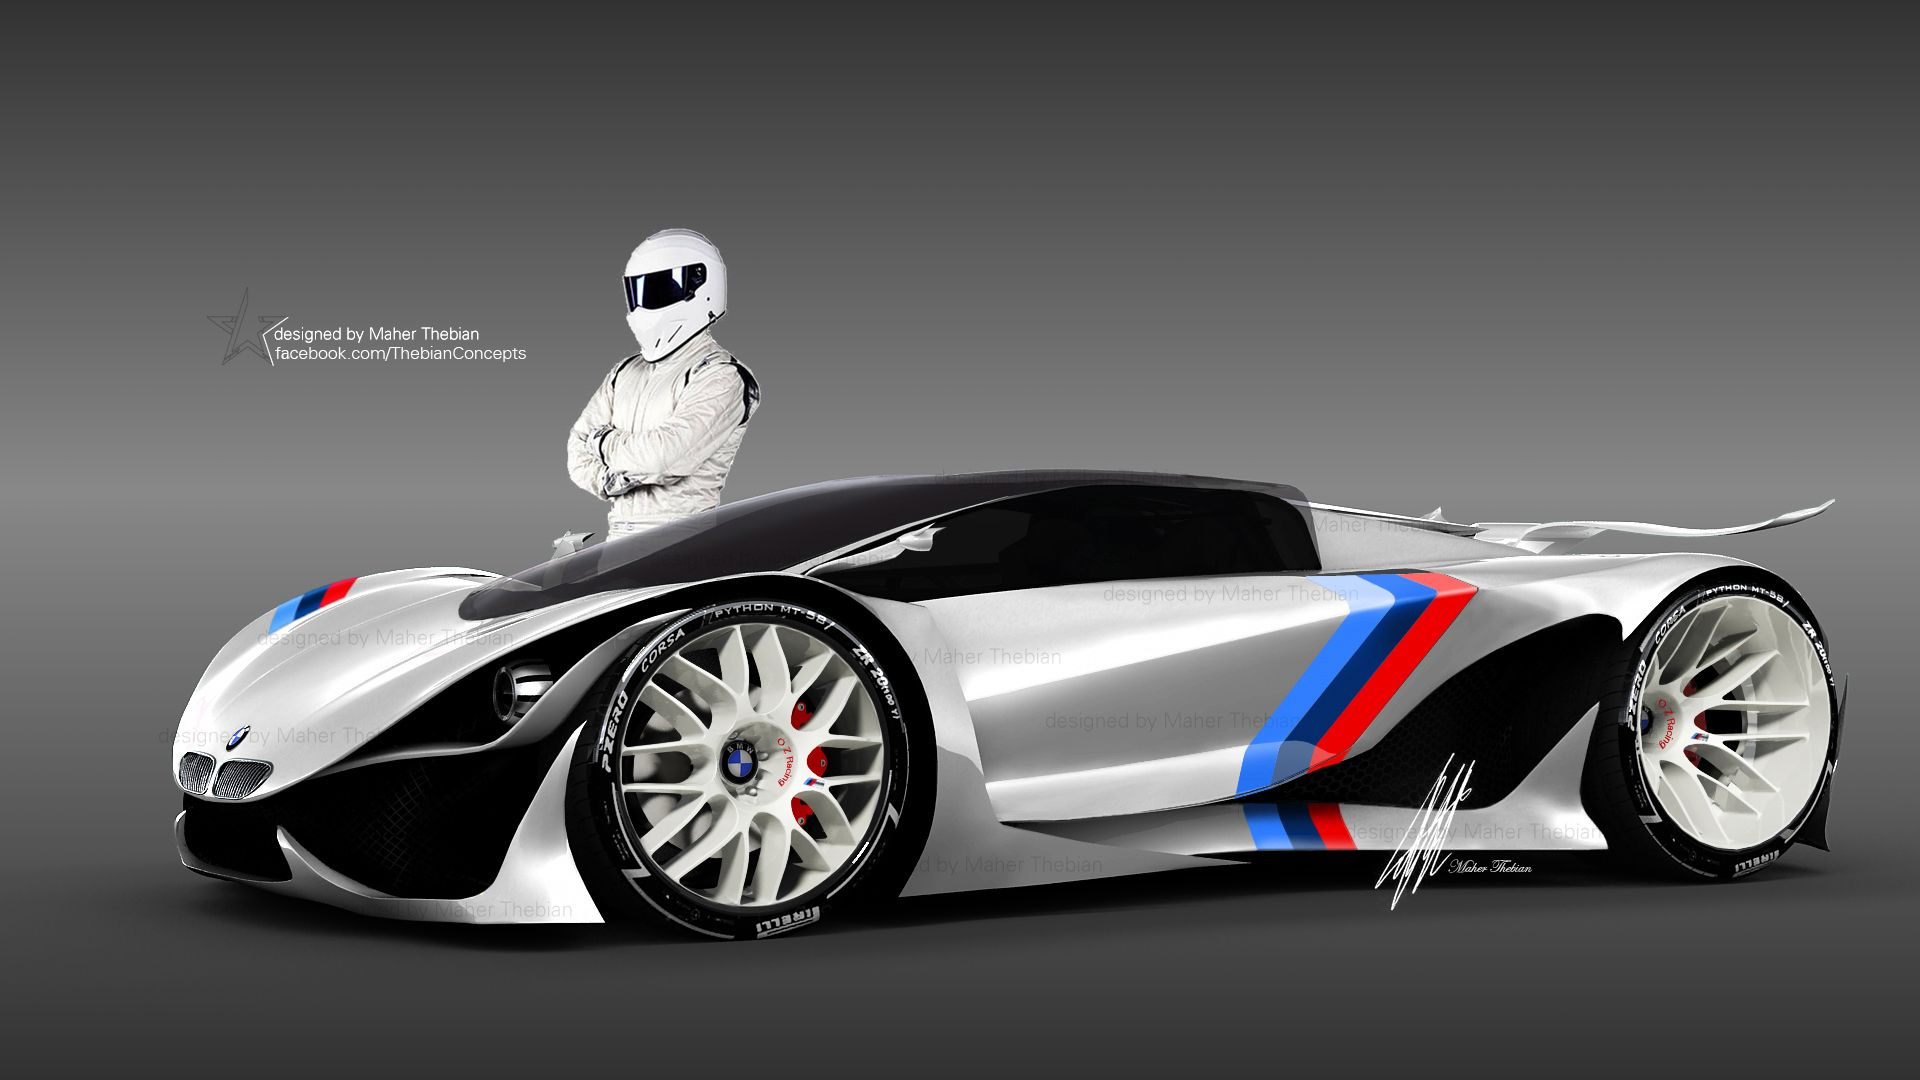 Thebian Concepts Concept Cars Concept Car Design Bmw